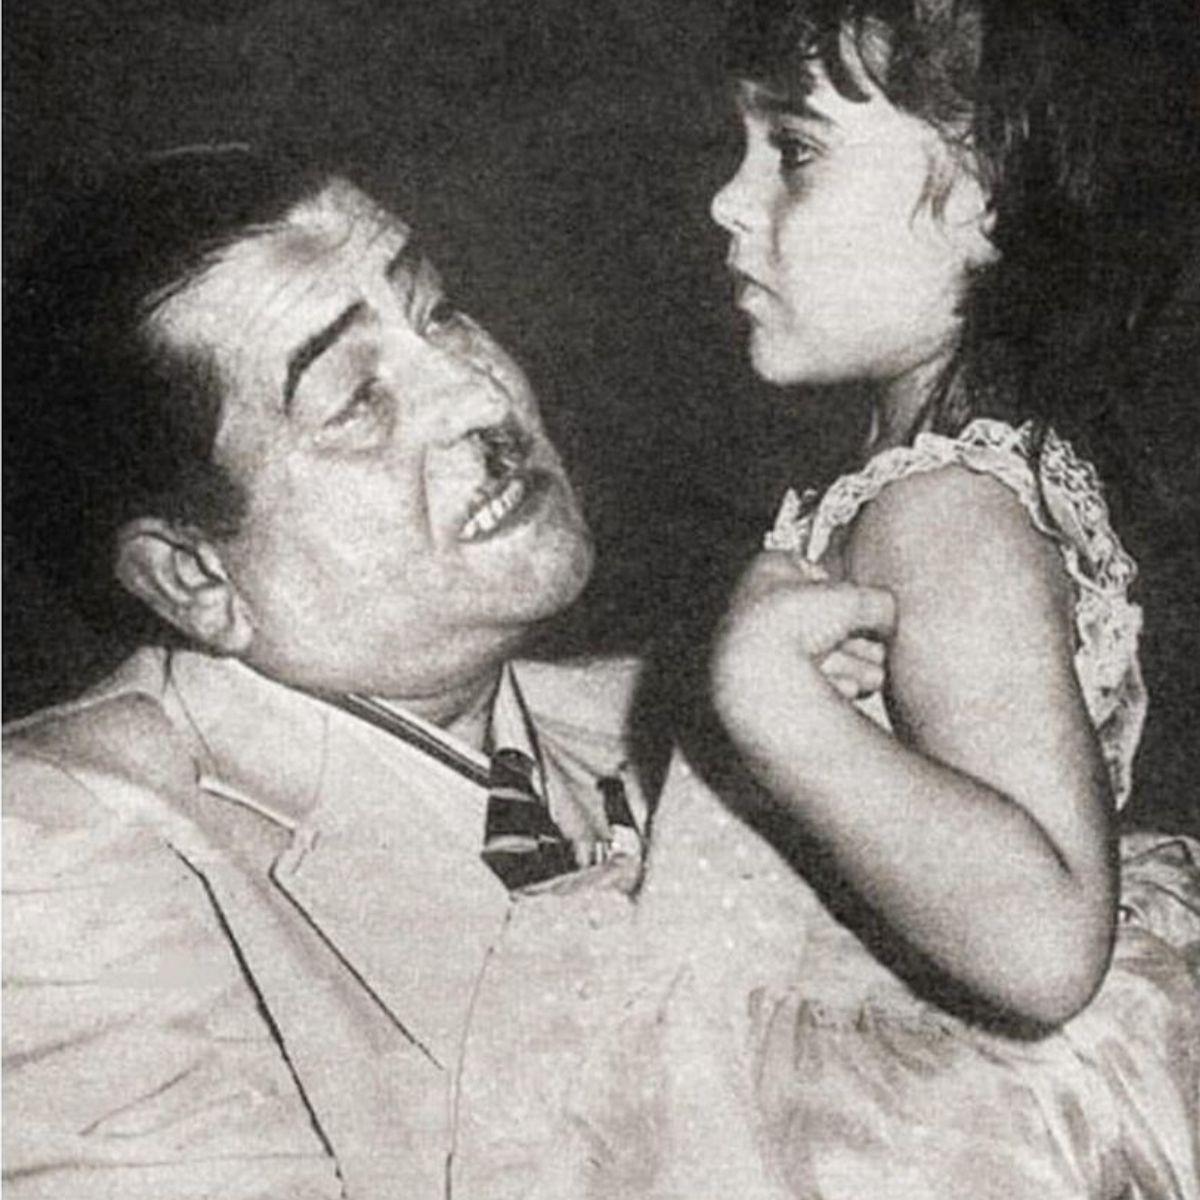 Raj Kapoor Birth Anniversary Karisma And Kareena Kapoor Khan Remember Their Grandfather With Rare Photos In 2020 Rare Photos Childhood Photos Kareena Kapoor Khan